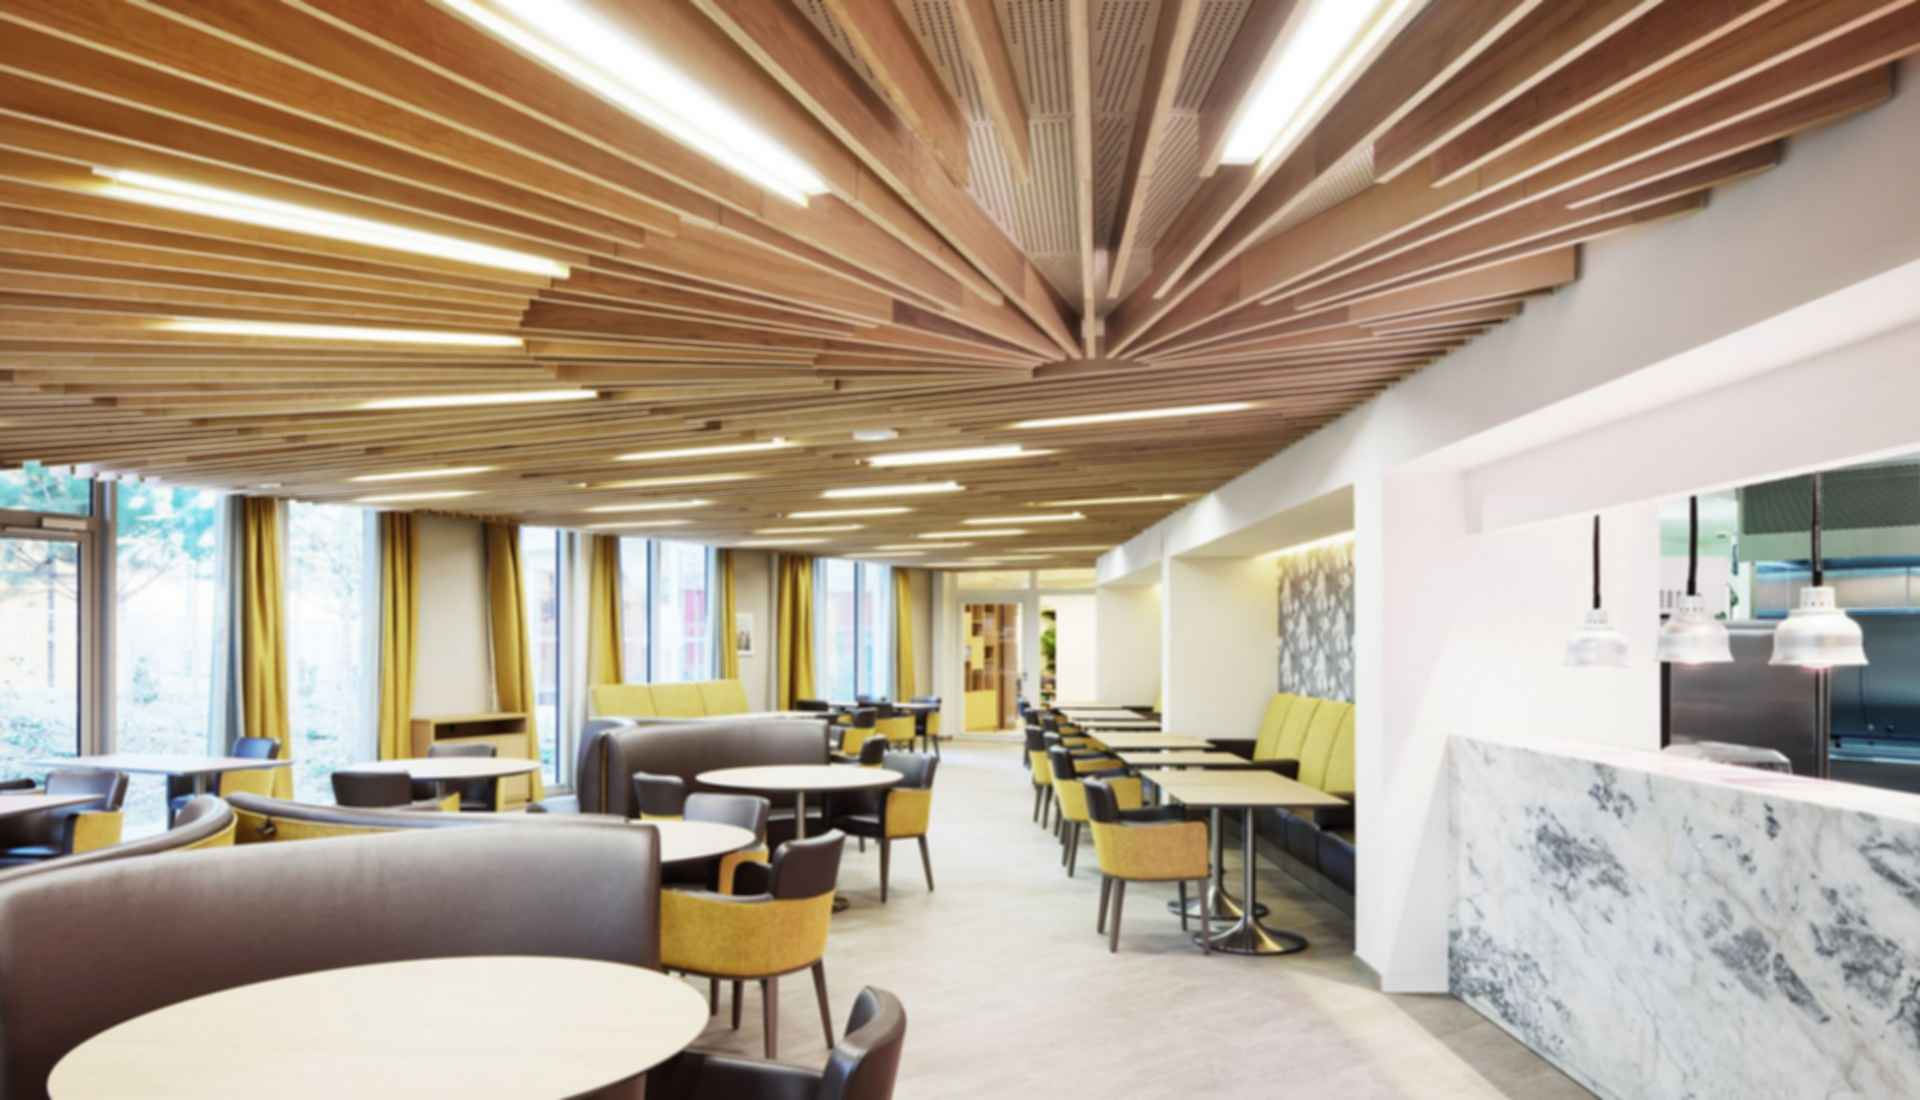 Nursing Home in Batignolles - Dining Area